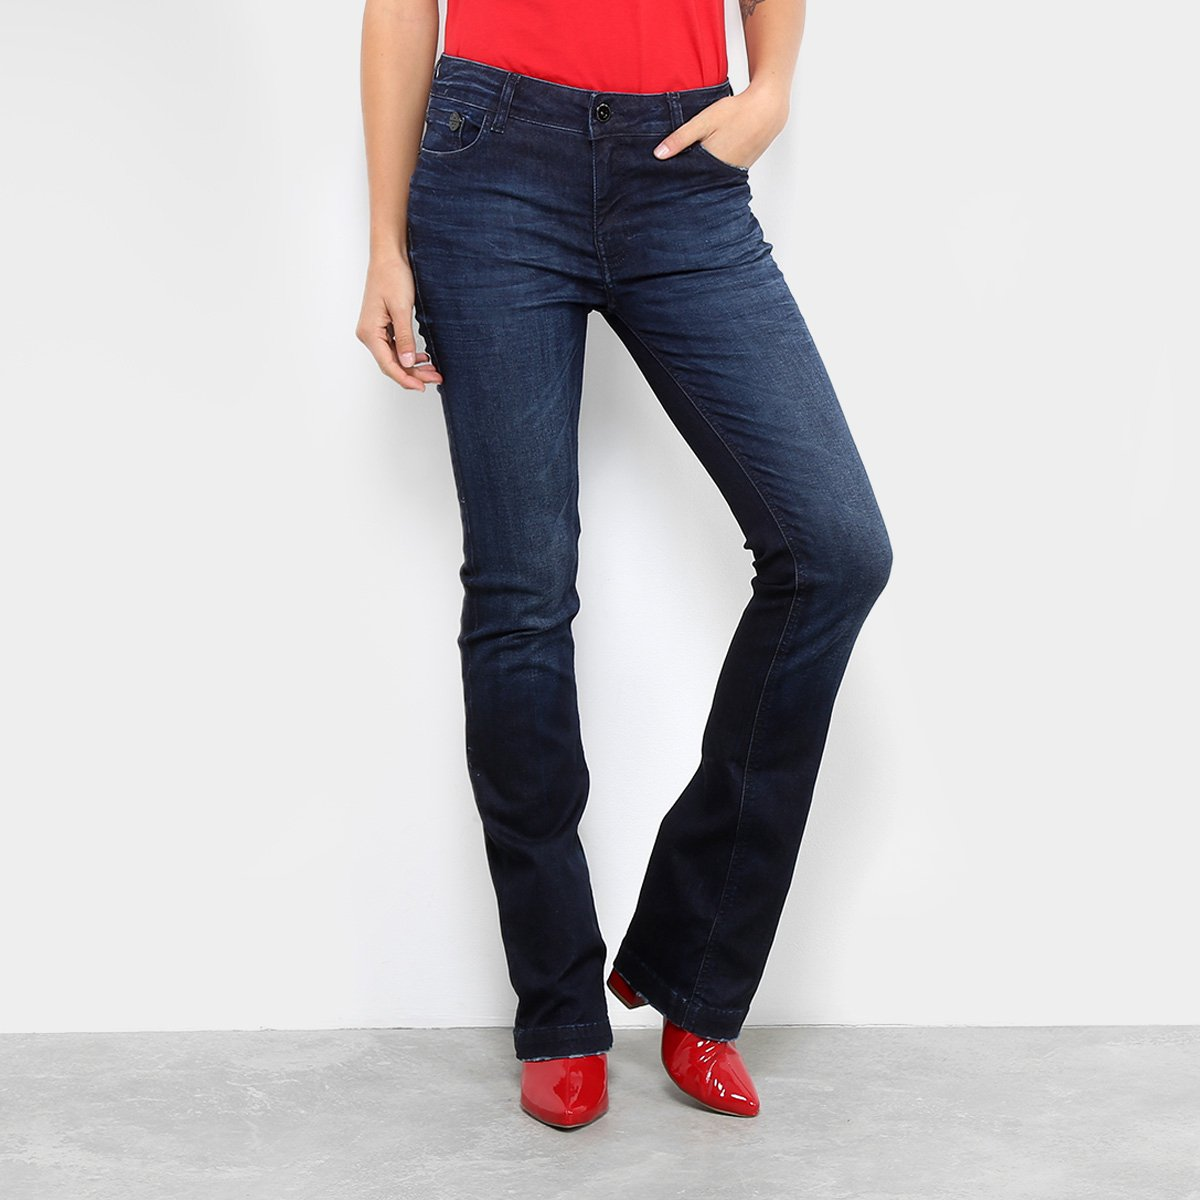 Calça Jeans Ellus Bootcut Lavagem Estonada Cintura Média Feminina 37c0e758300